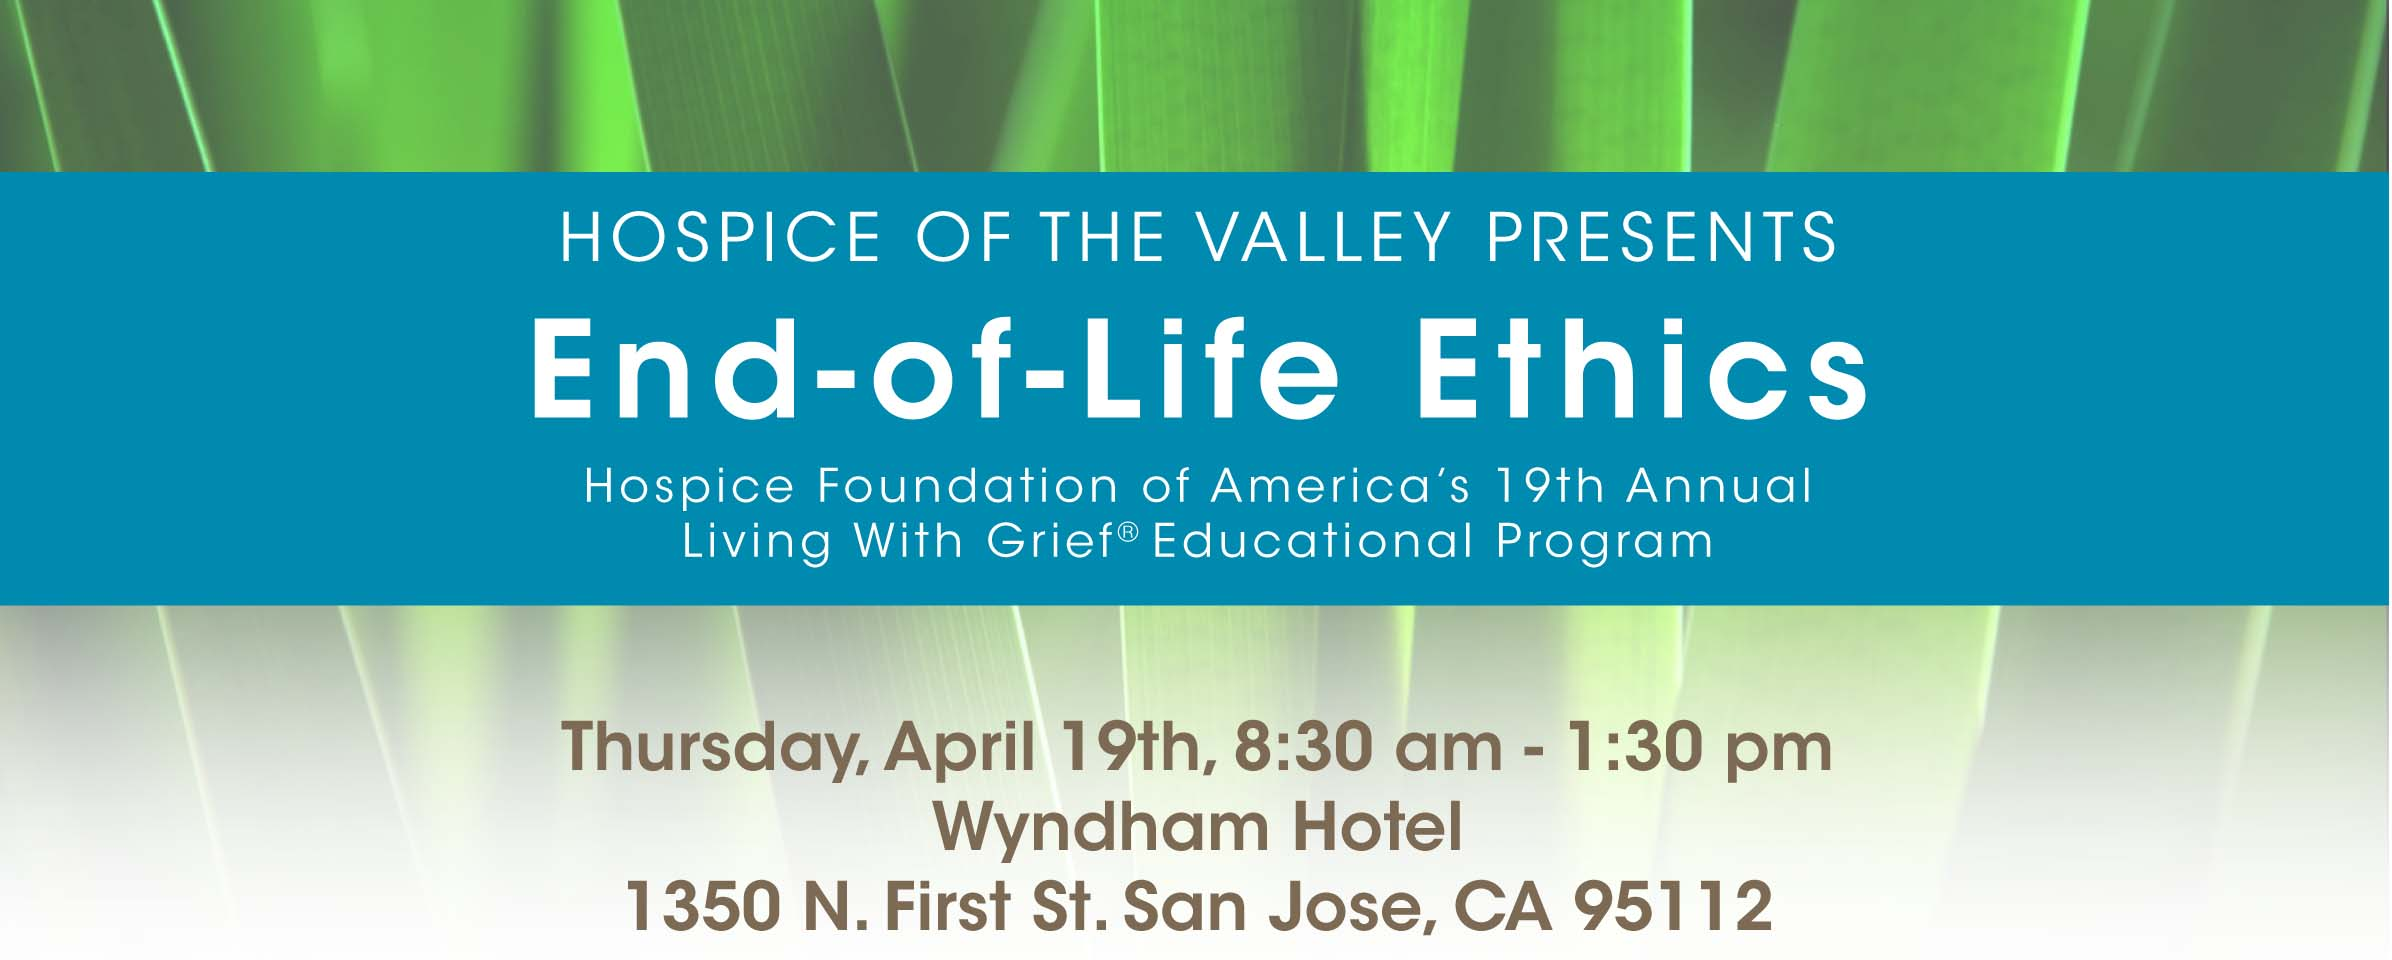 HFA End-of-Life Ethics